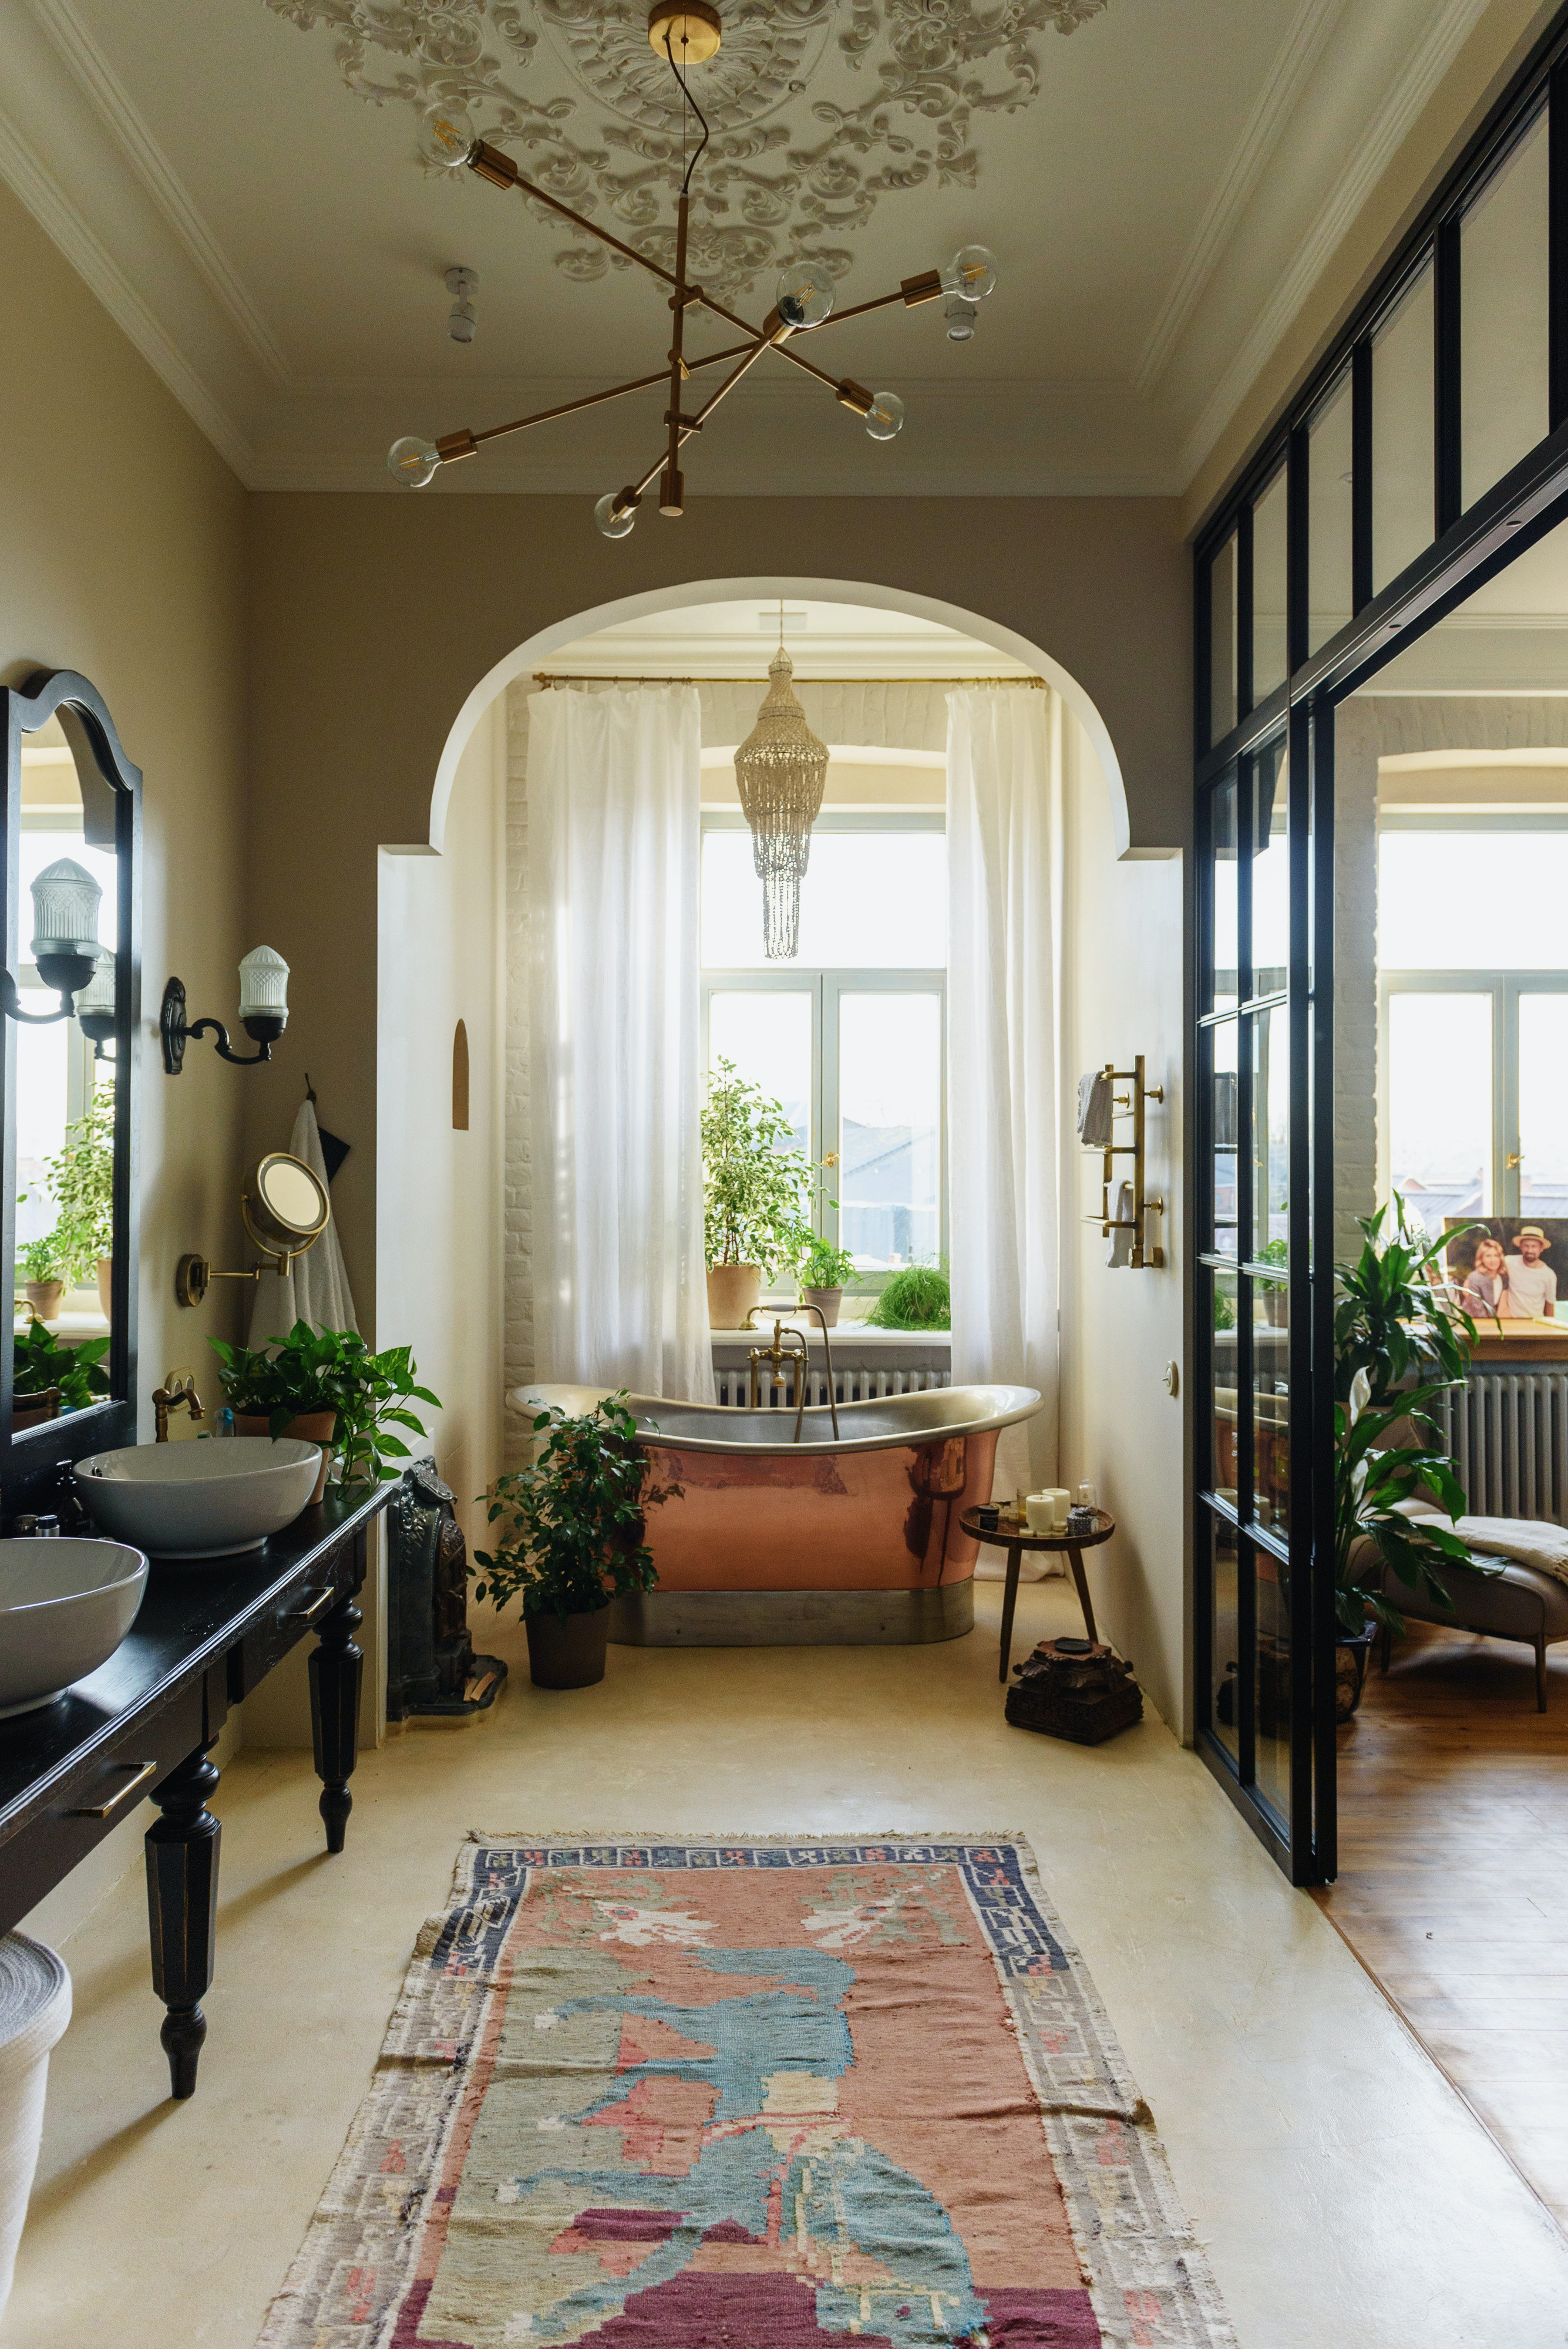 Interior Design Of Cozy Spacious Bathroom Free Stock Photo